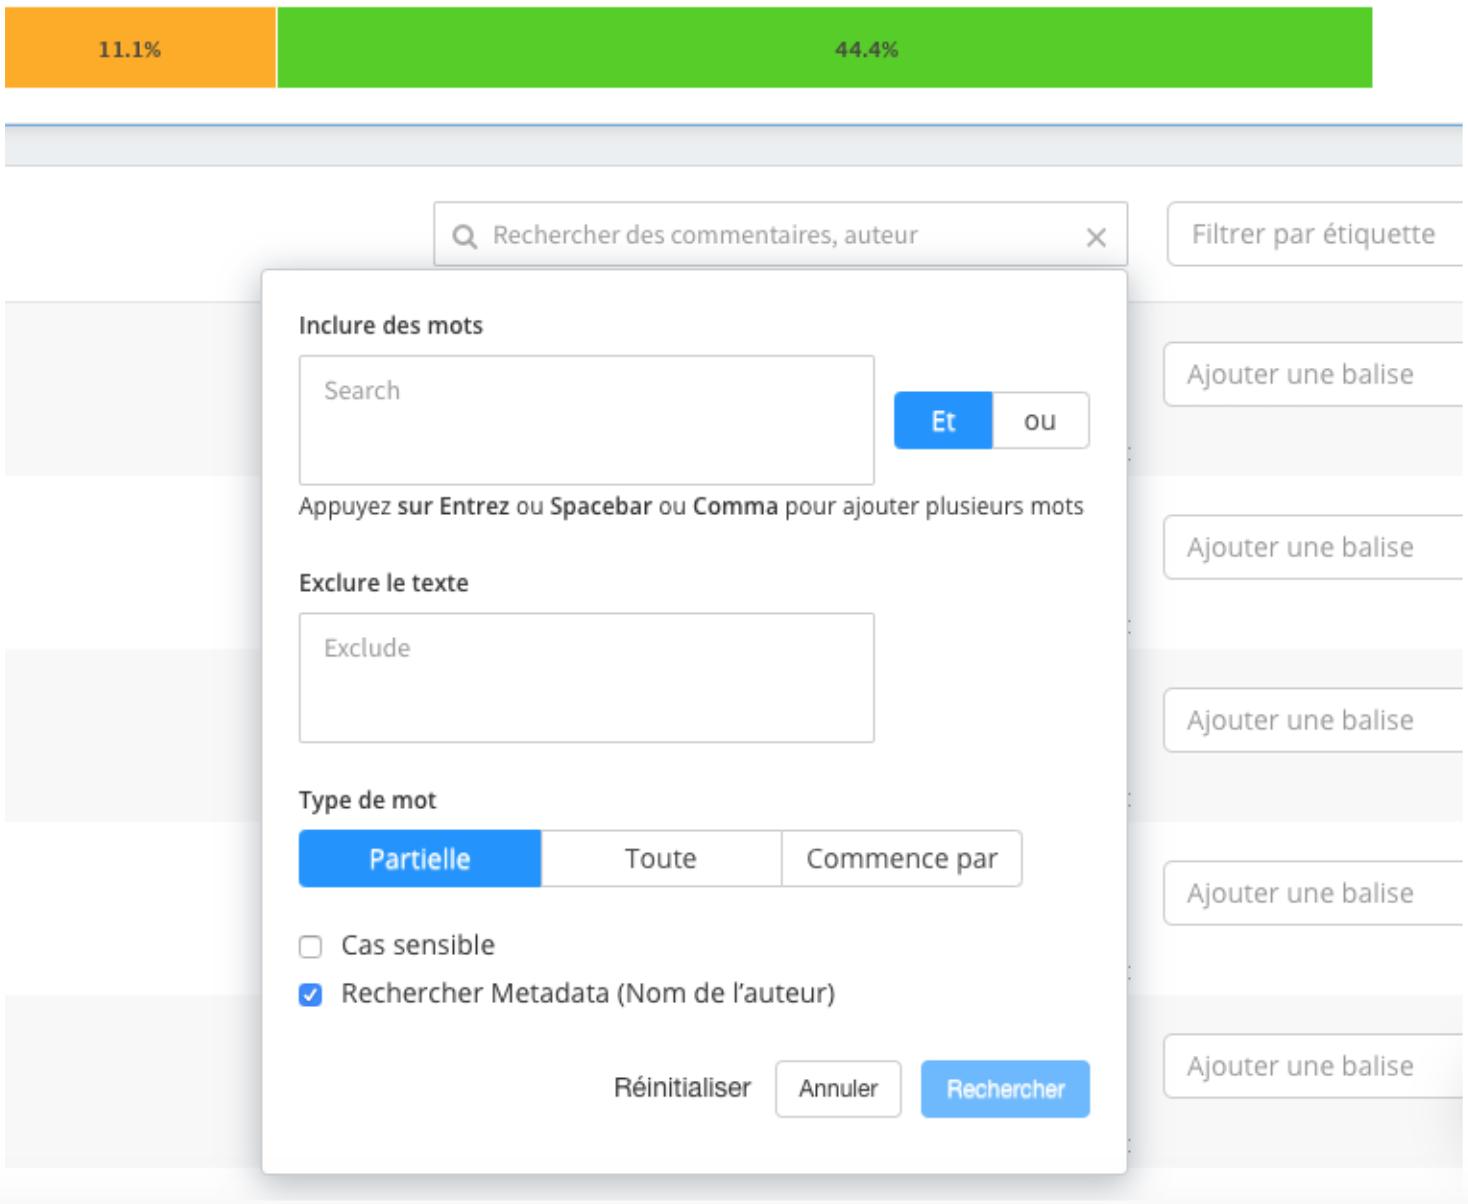 screenshot of computer screen